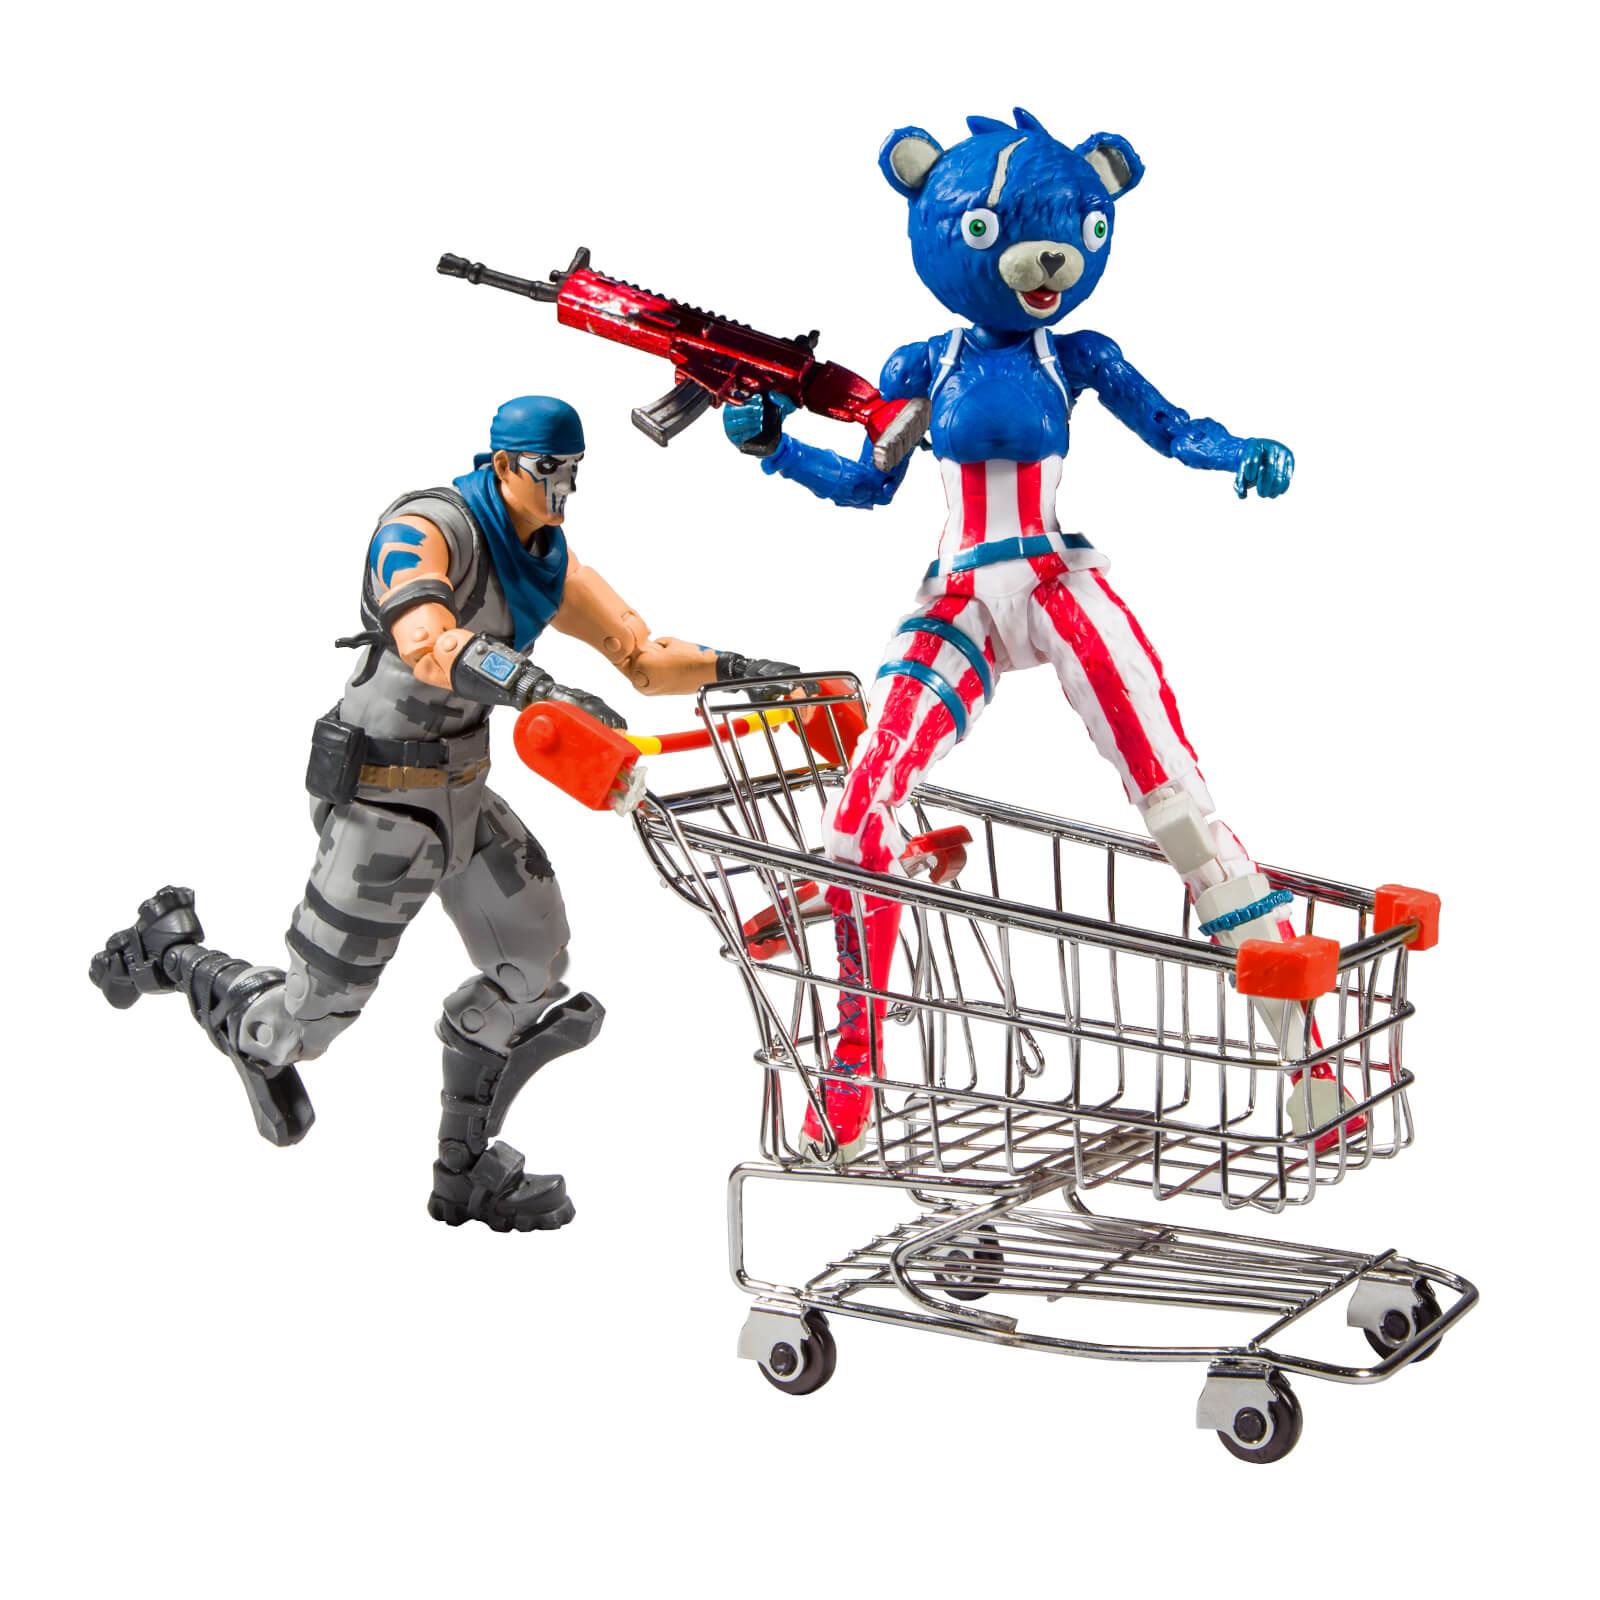 Fortnite Shopping Cart Pack With War Paint and Fireworks Team Leader - £19.98 Delivered @ Zavvi